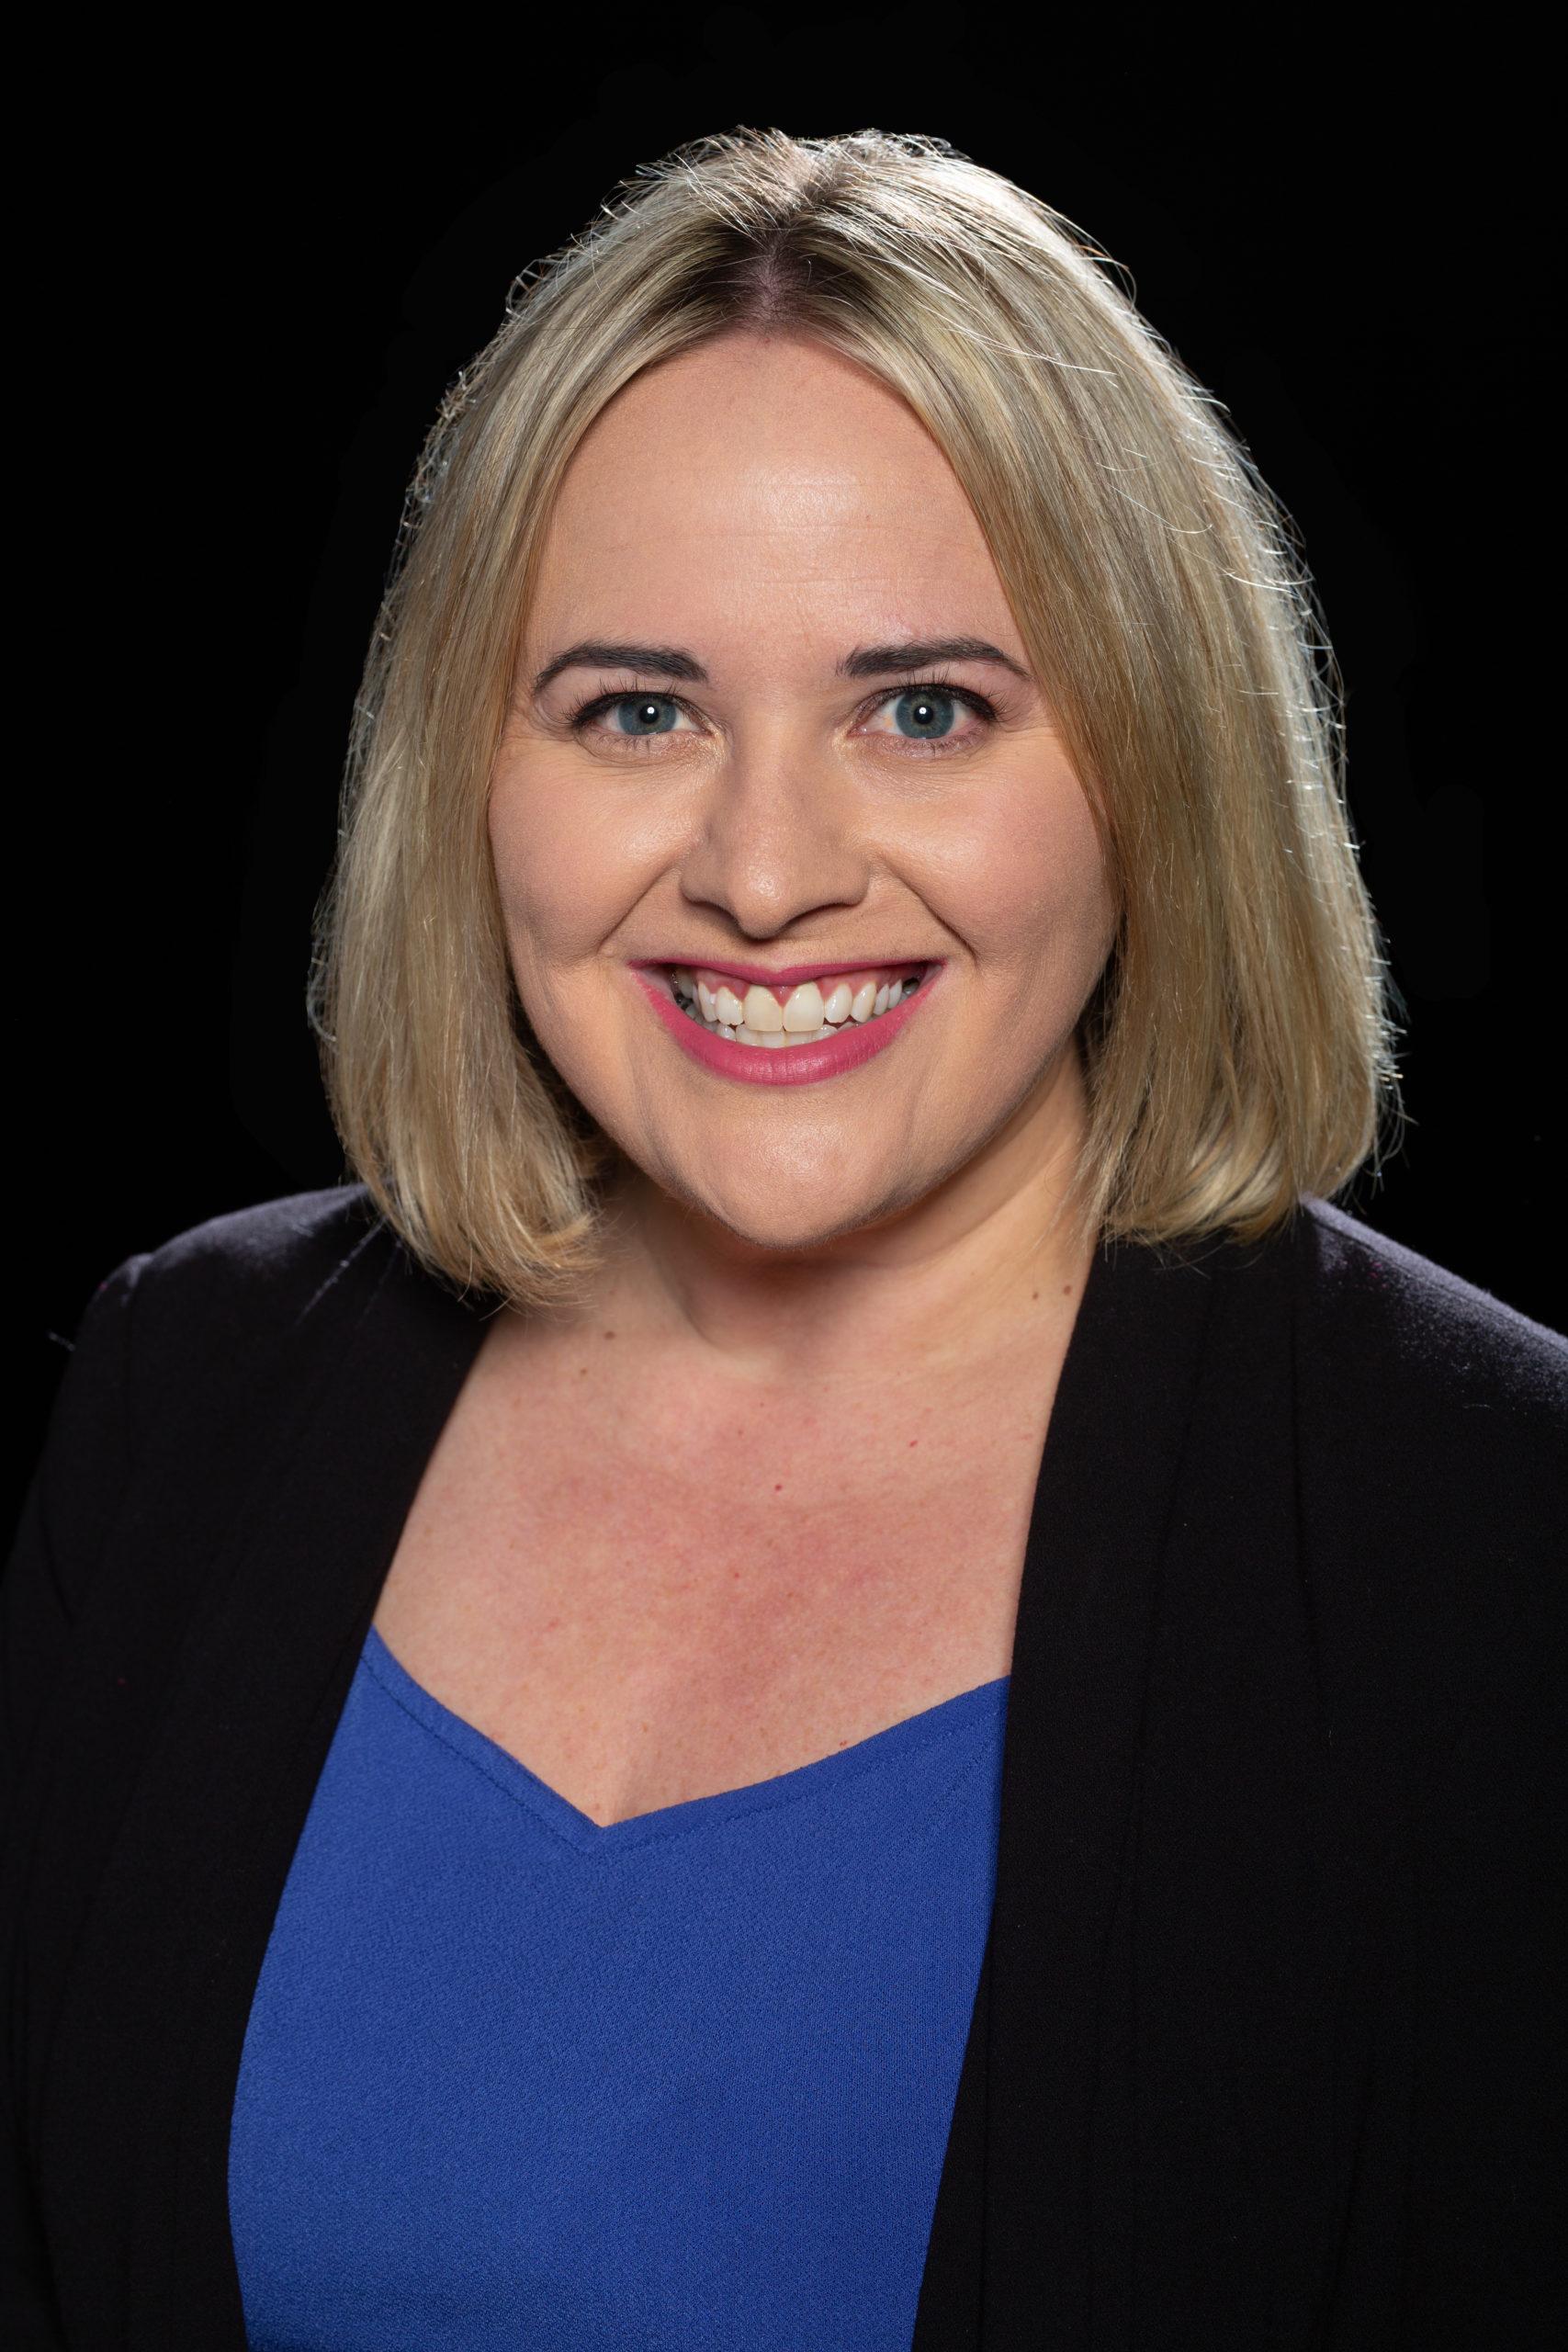 WHBPAC Board of Directors Names Julienne Penza-Boone Executive Director